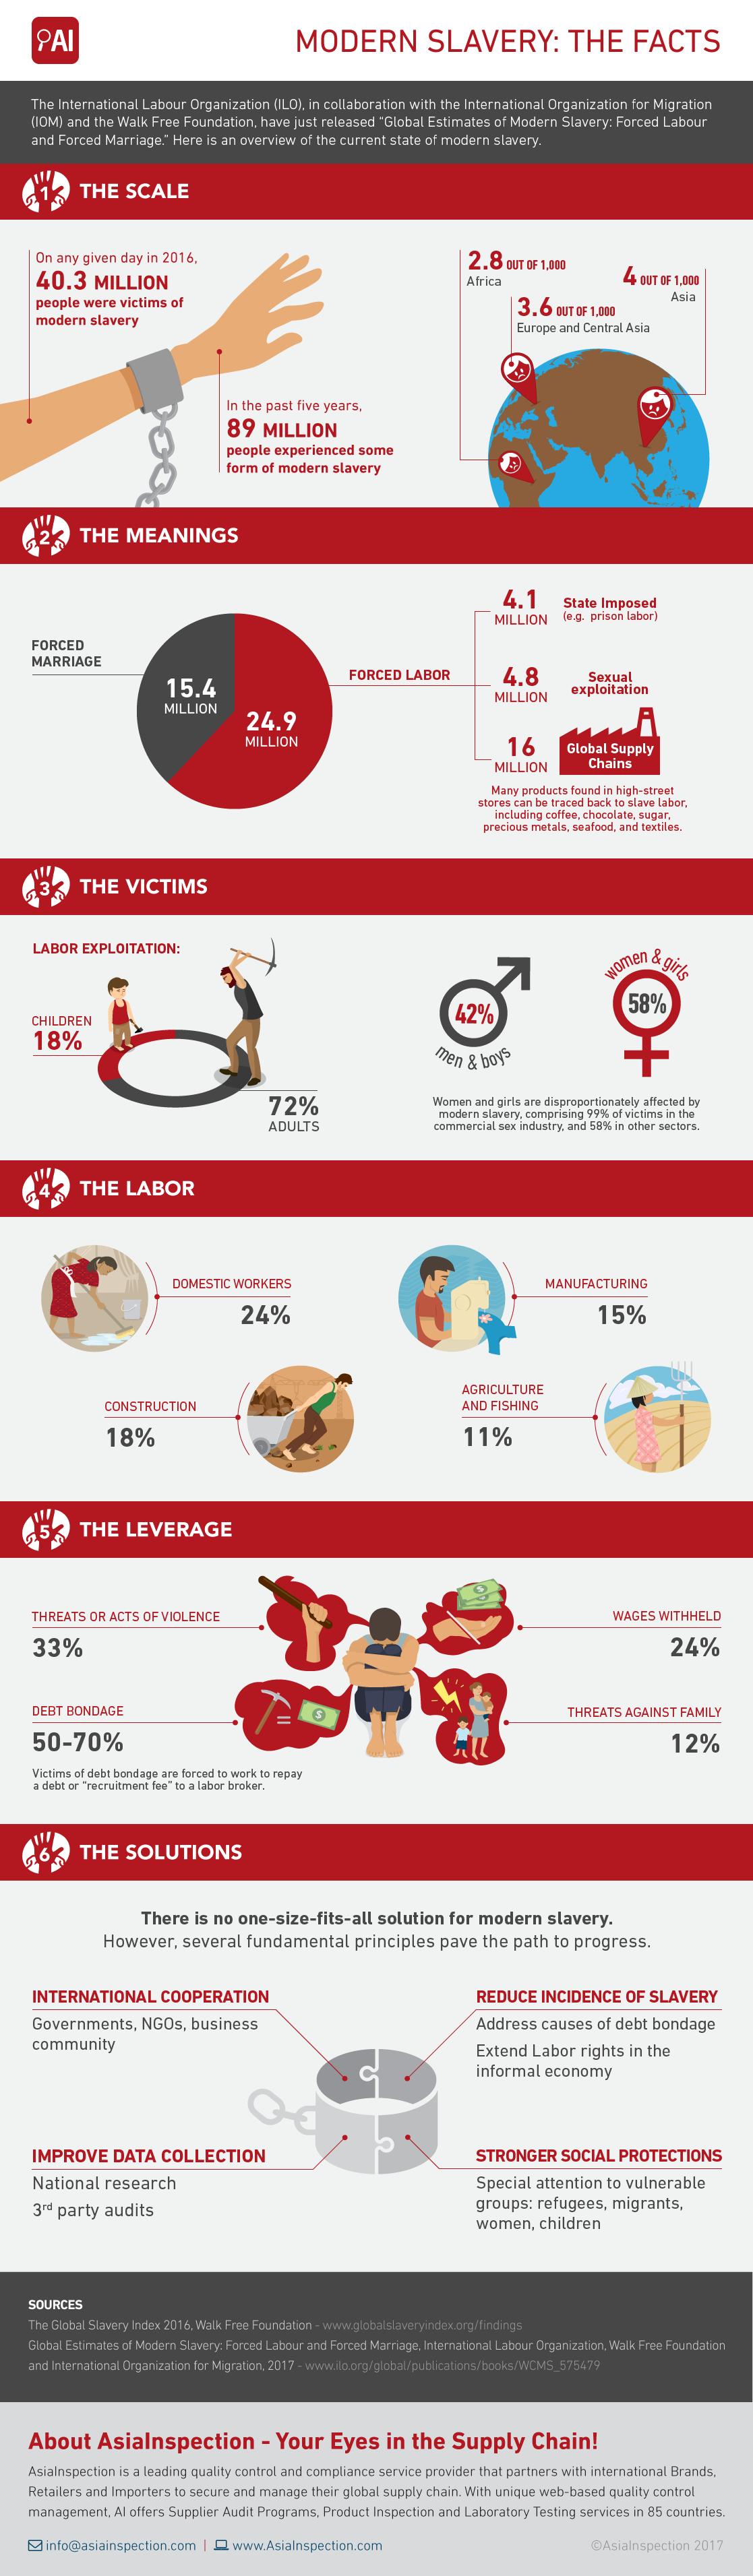 Modern Slavery ILO Infographic